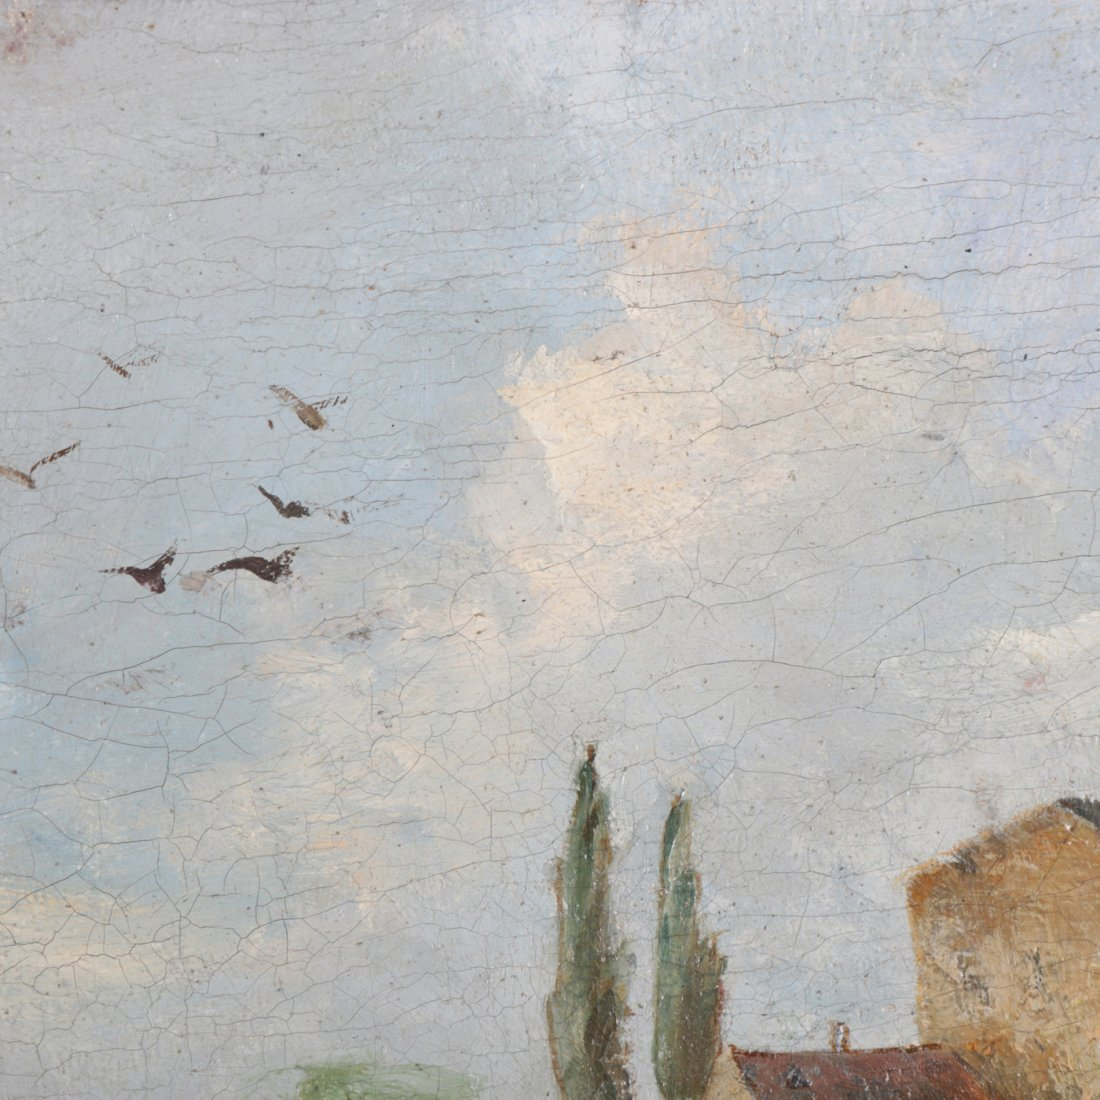 Antique Oil on Canvas Landscape Painting with Farm - 3